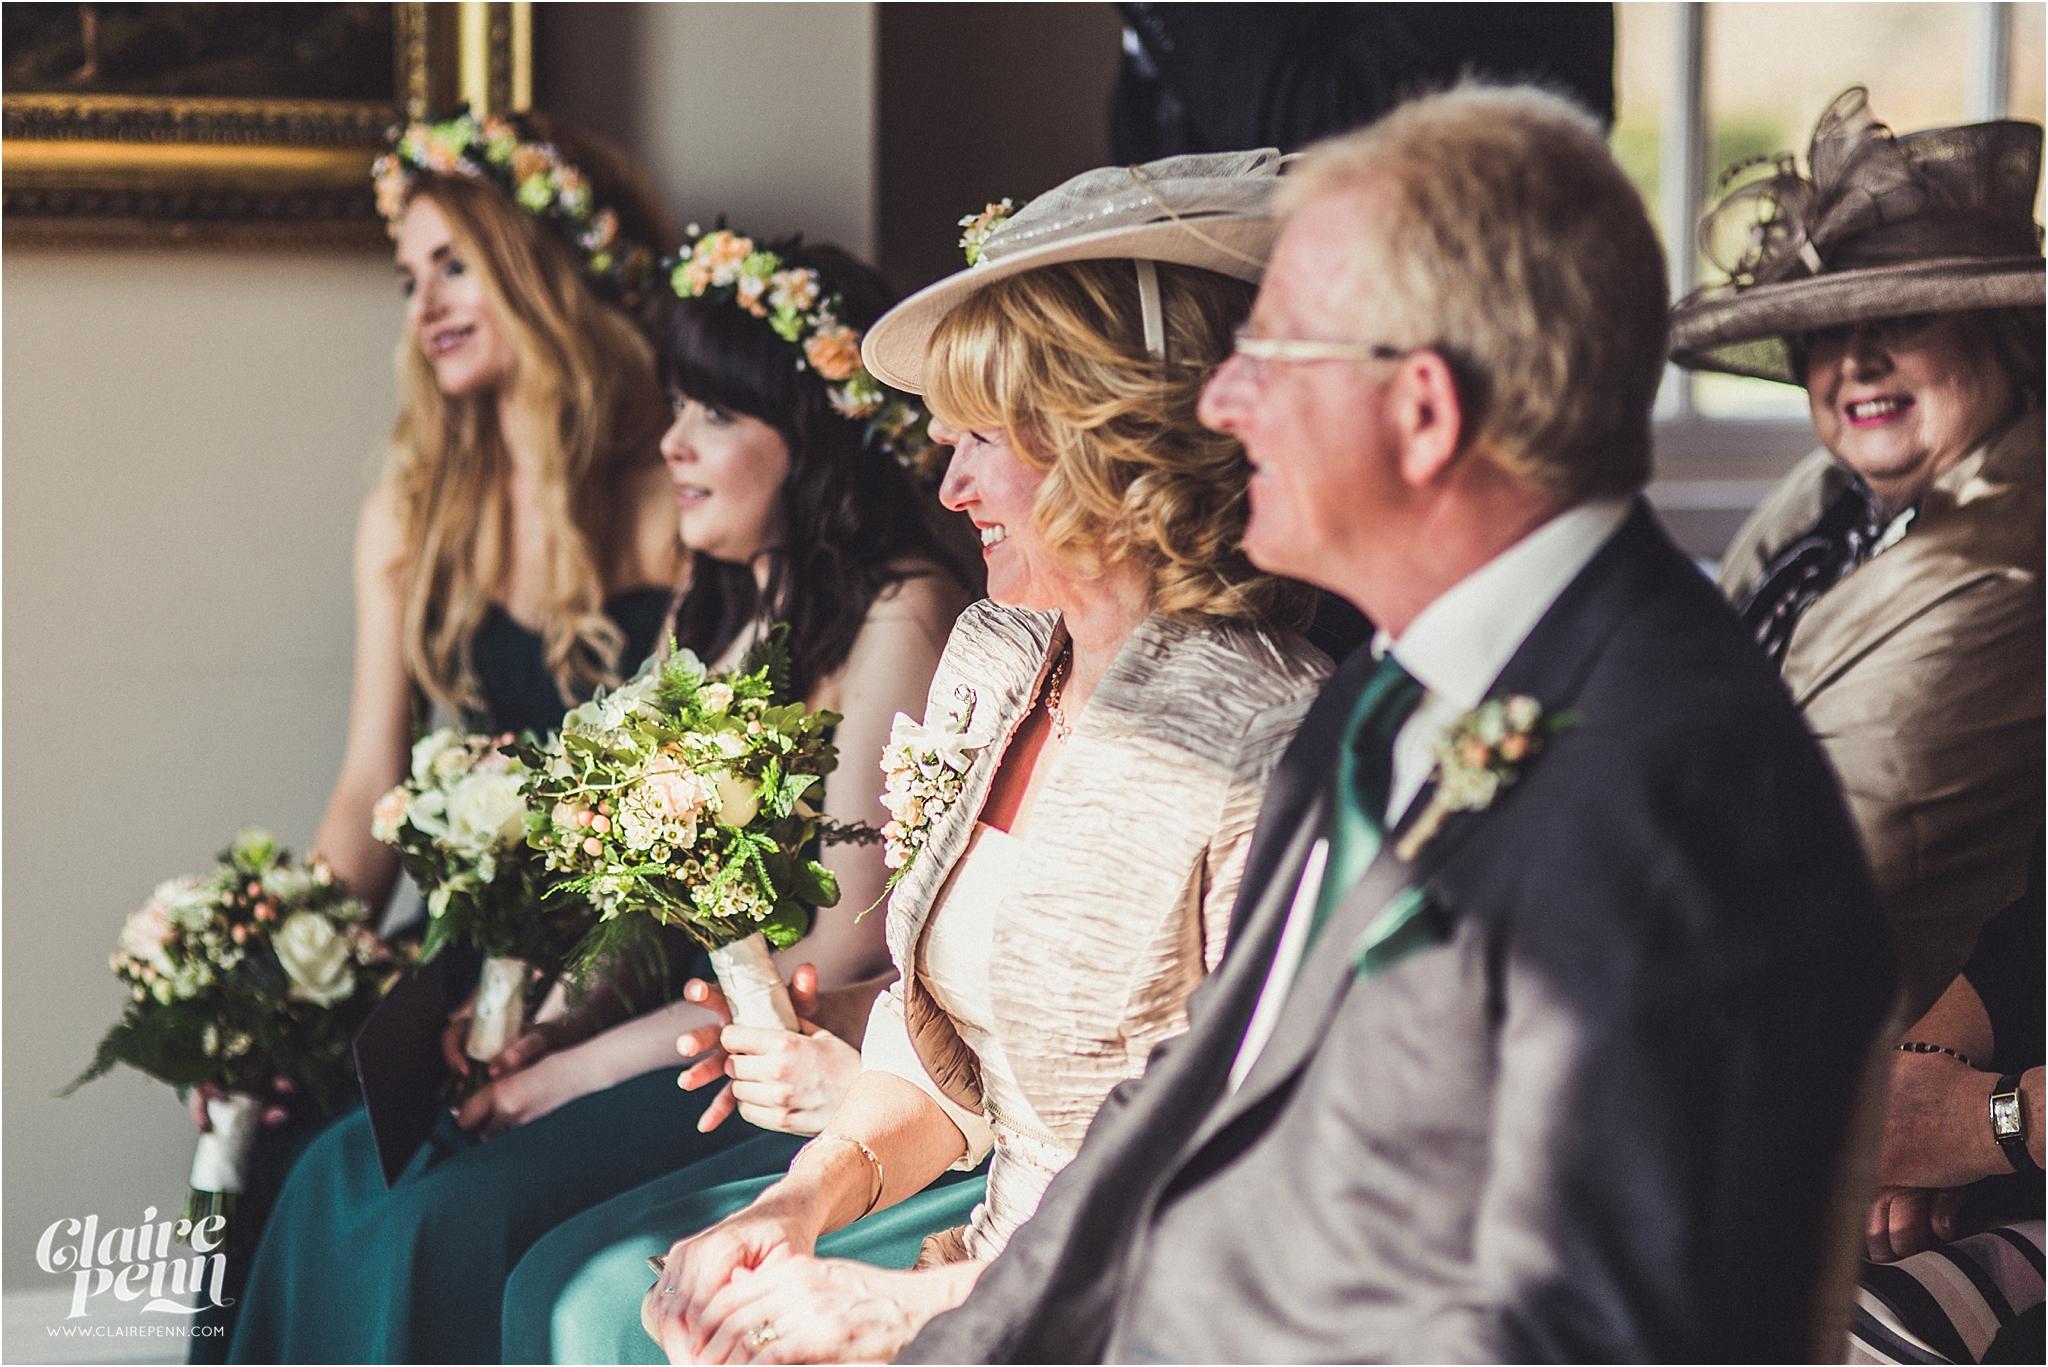 Iscoyd Park wedding, Whitchurch, Cheshire wedding photographer_0023.jpg